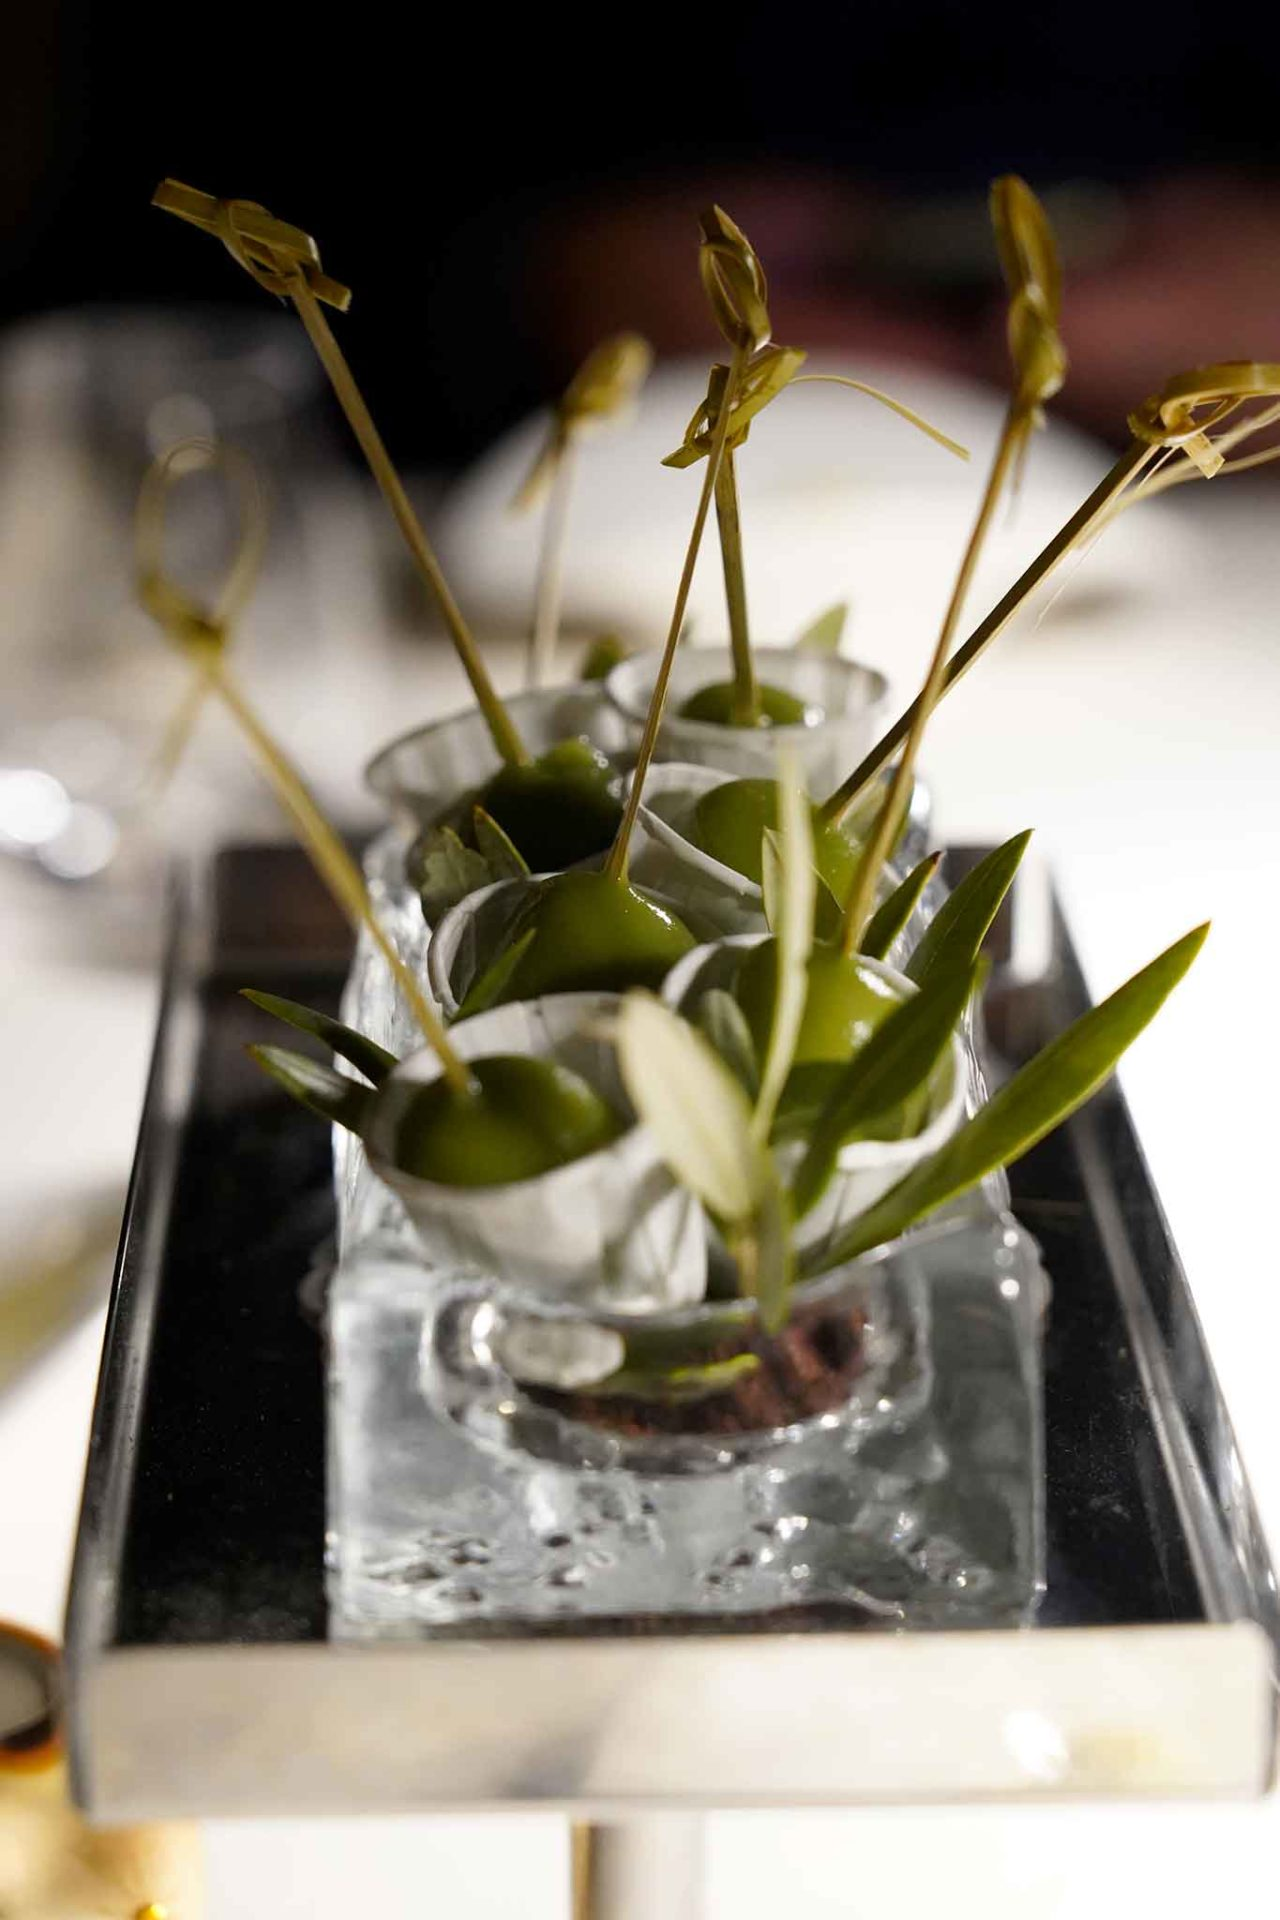 Mirabelle ristorante Roma staycation olive ascolane